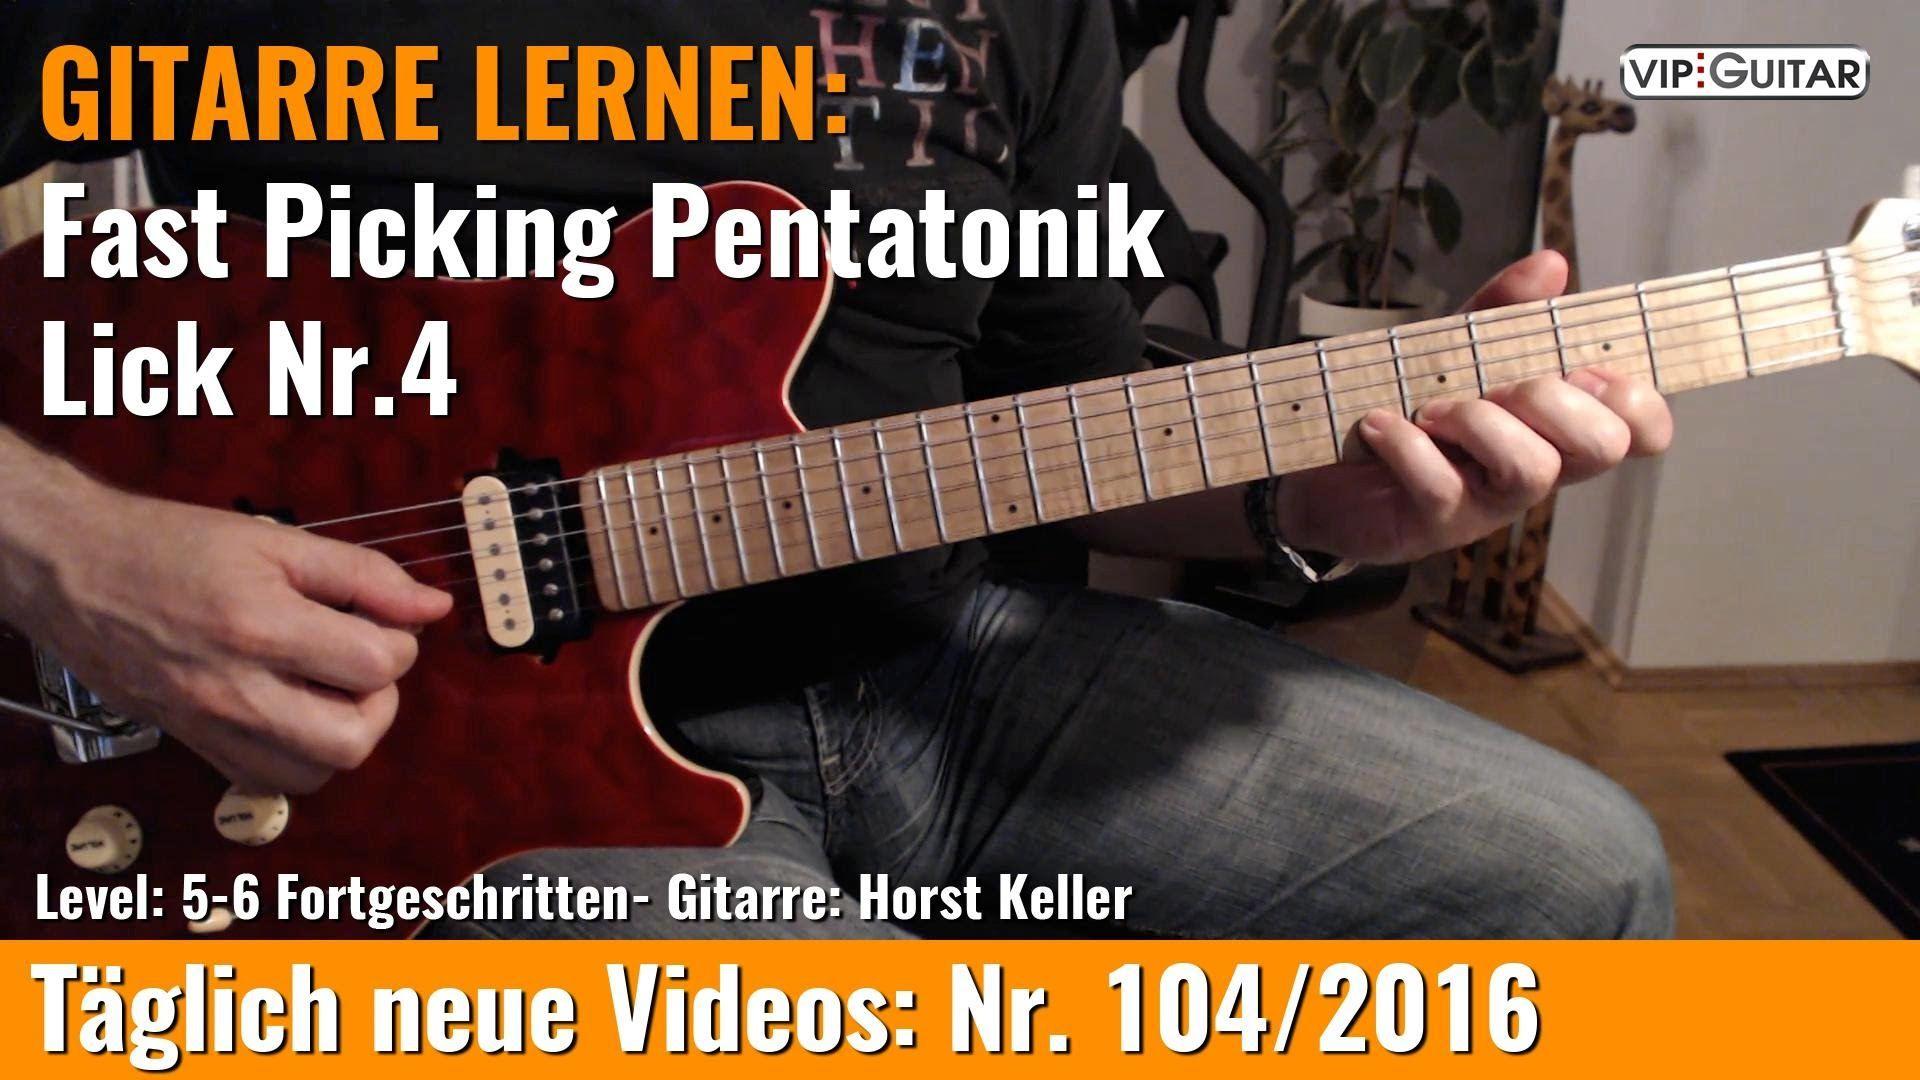 ✪ Pentatonik Training ■Alternate Picking Lick Nr 2 Gitarre lernen Pinterest